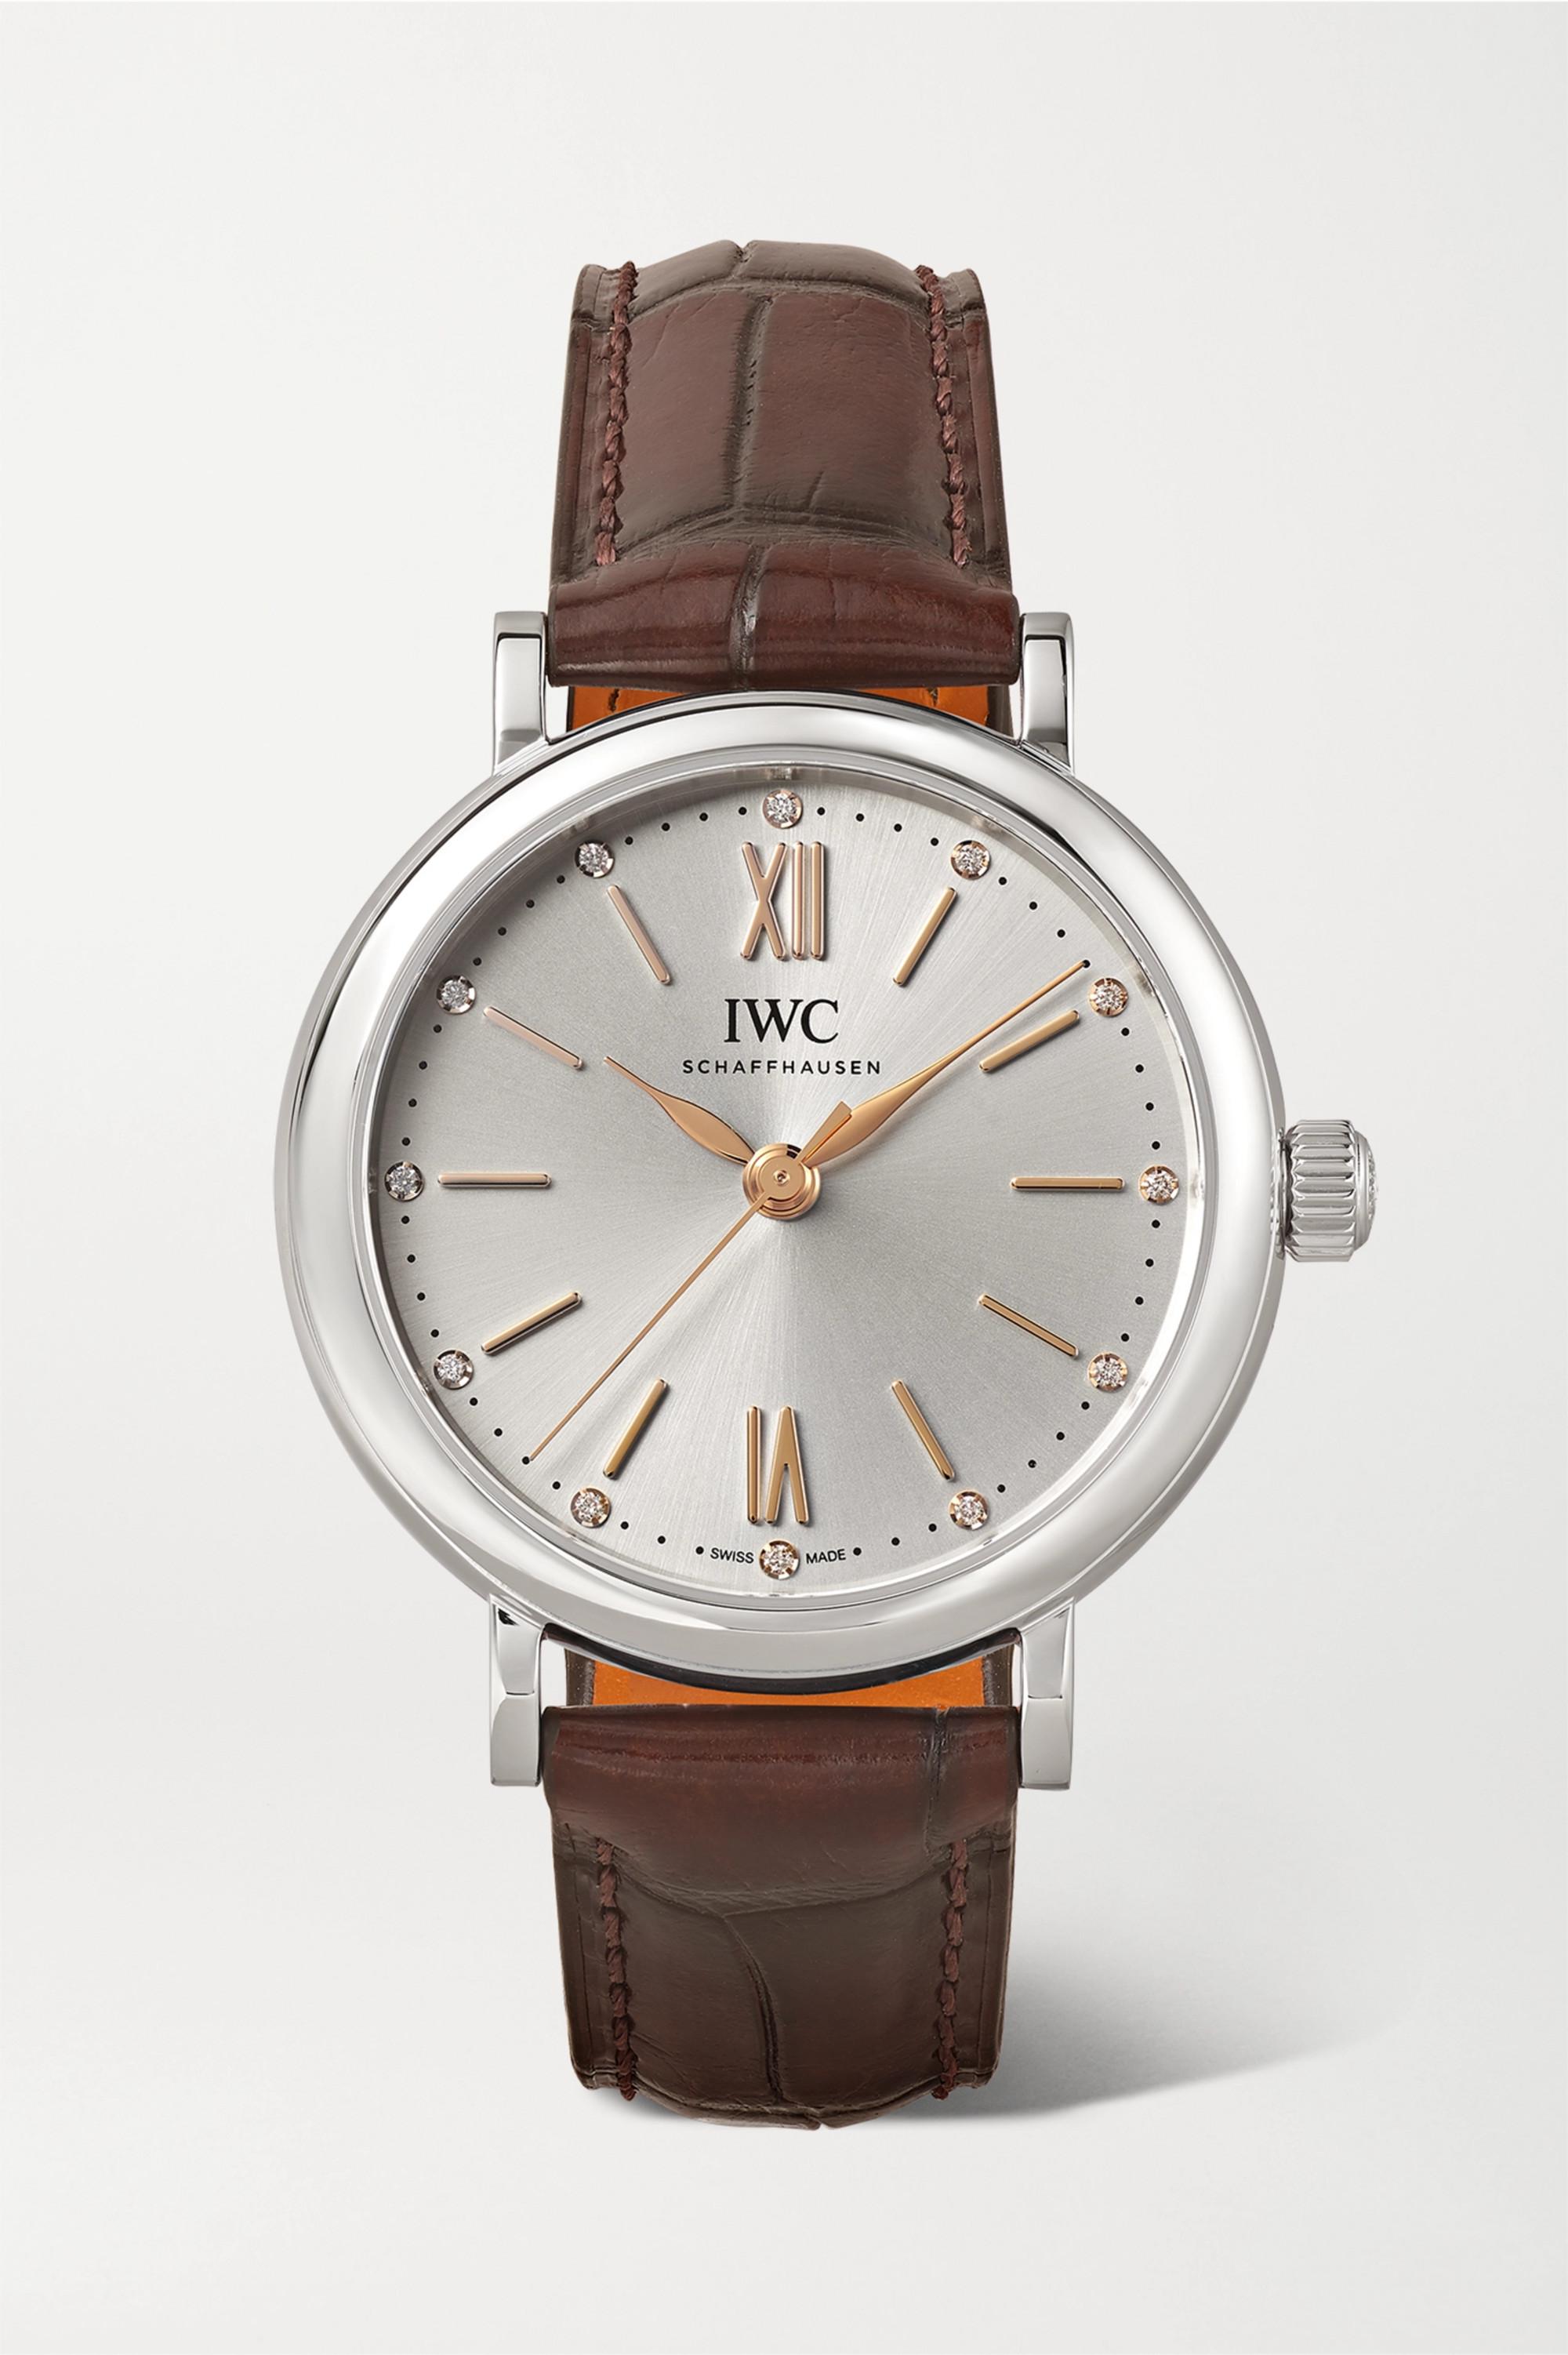 IWC SCHAFFHAUSEN Portofino Automatic 34mm stainless steel, alligator and diamond watch